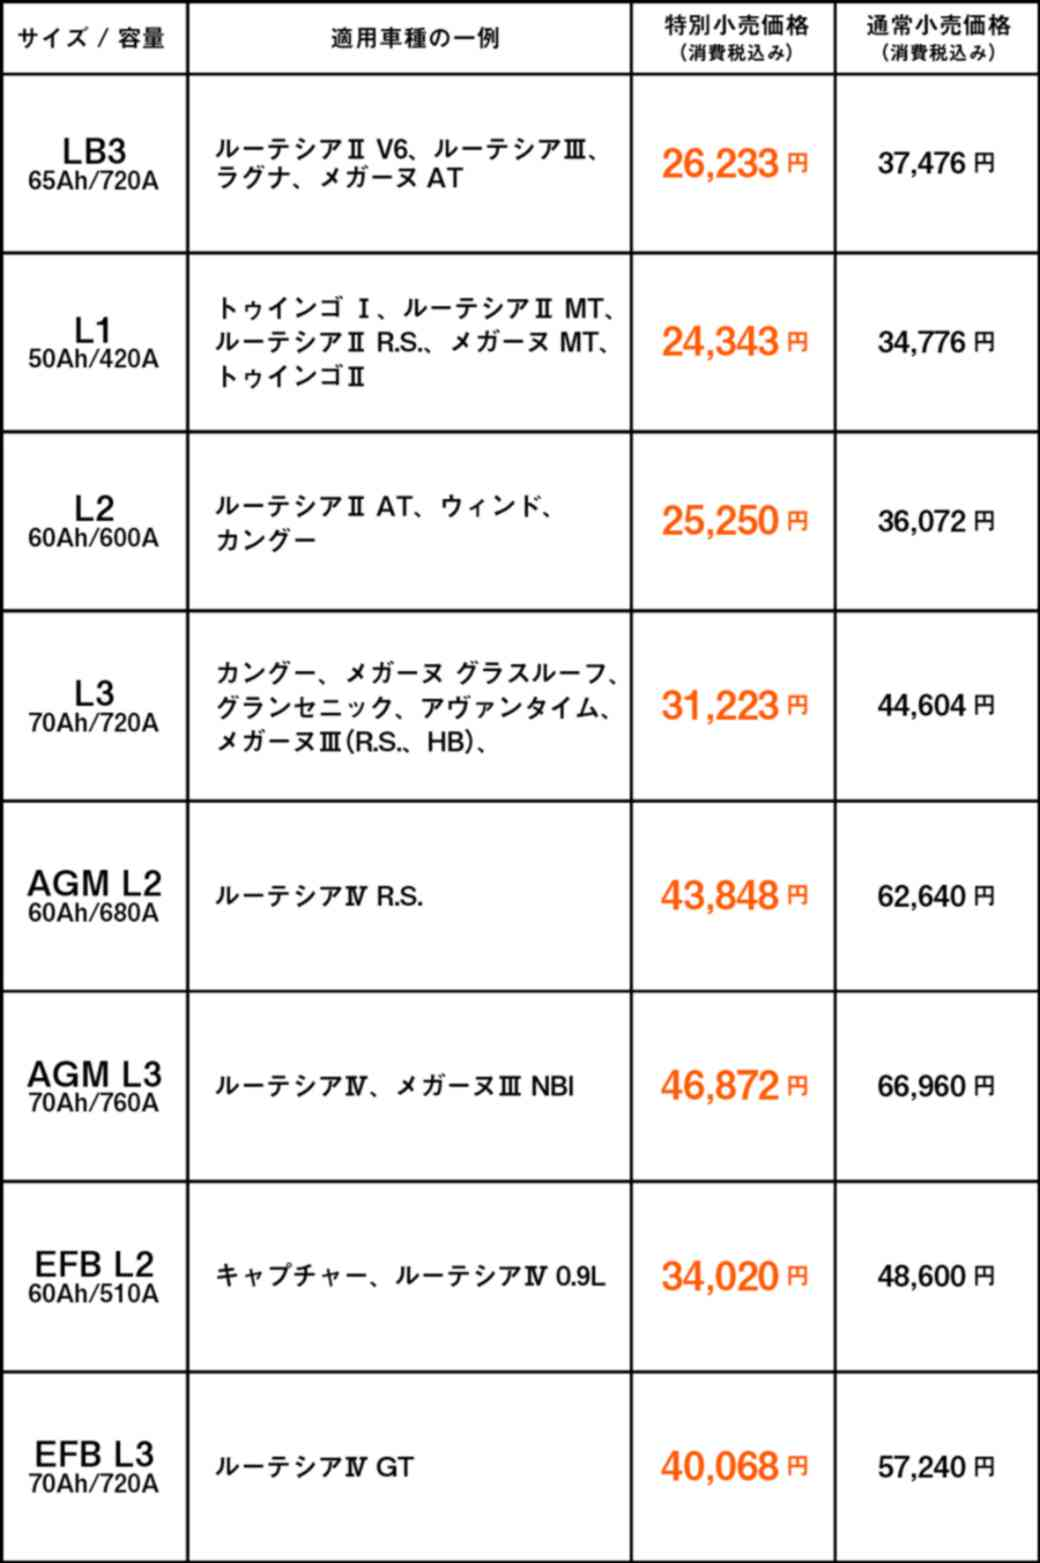 renault-japon-genuine-battery-30-off-campaign-until-august-31-2016-0624-2